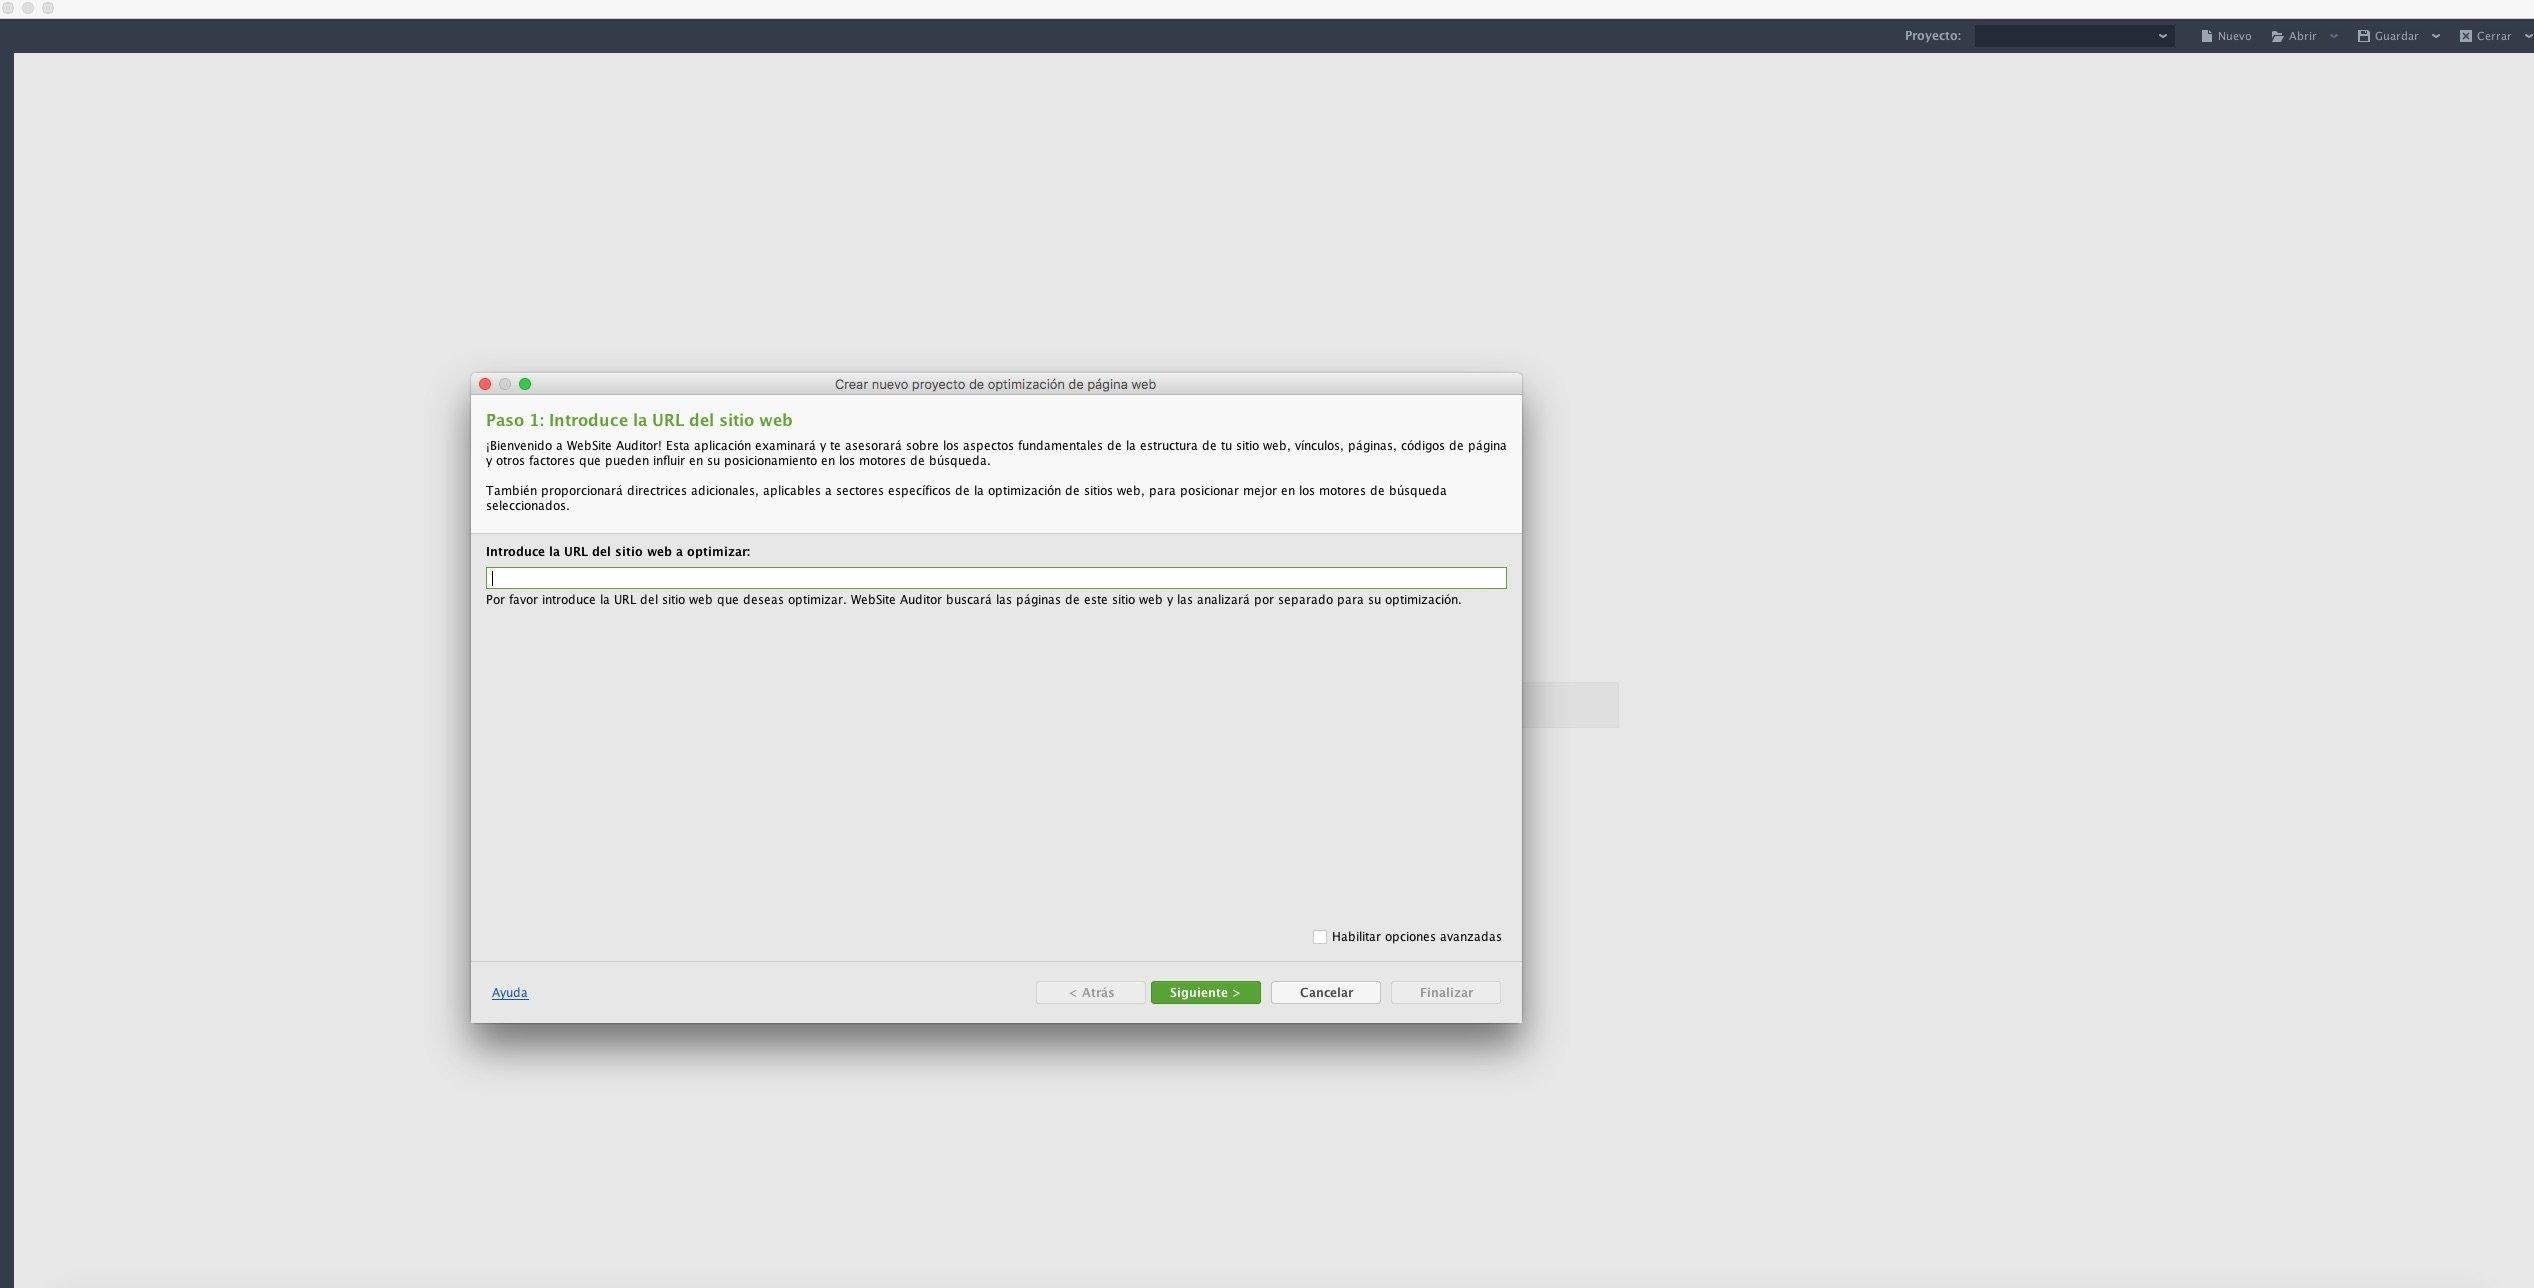 WebSite Auditor Mac image 8